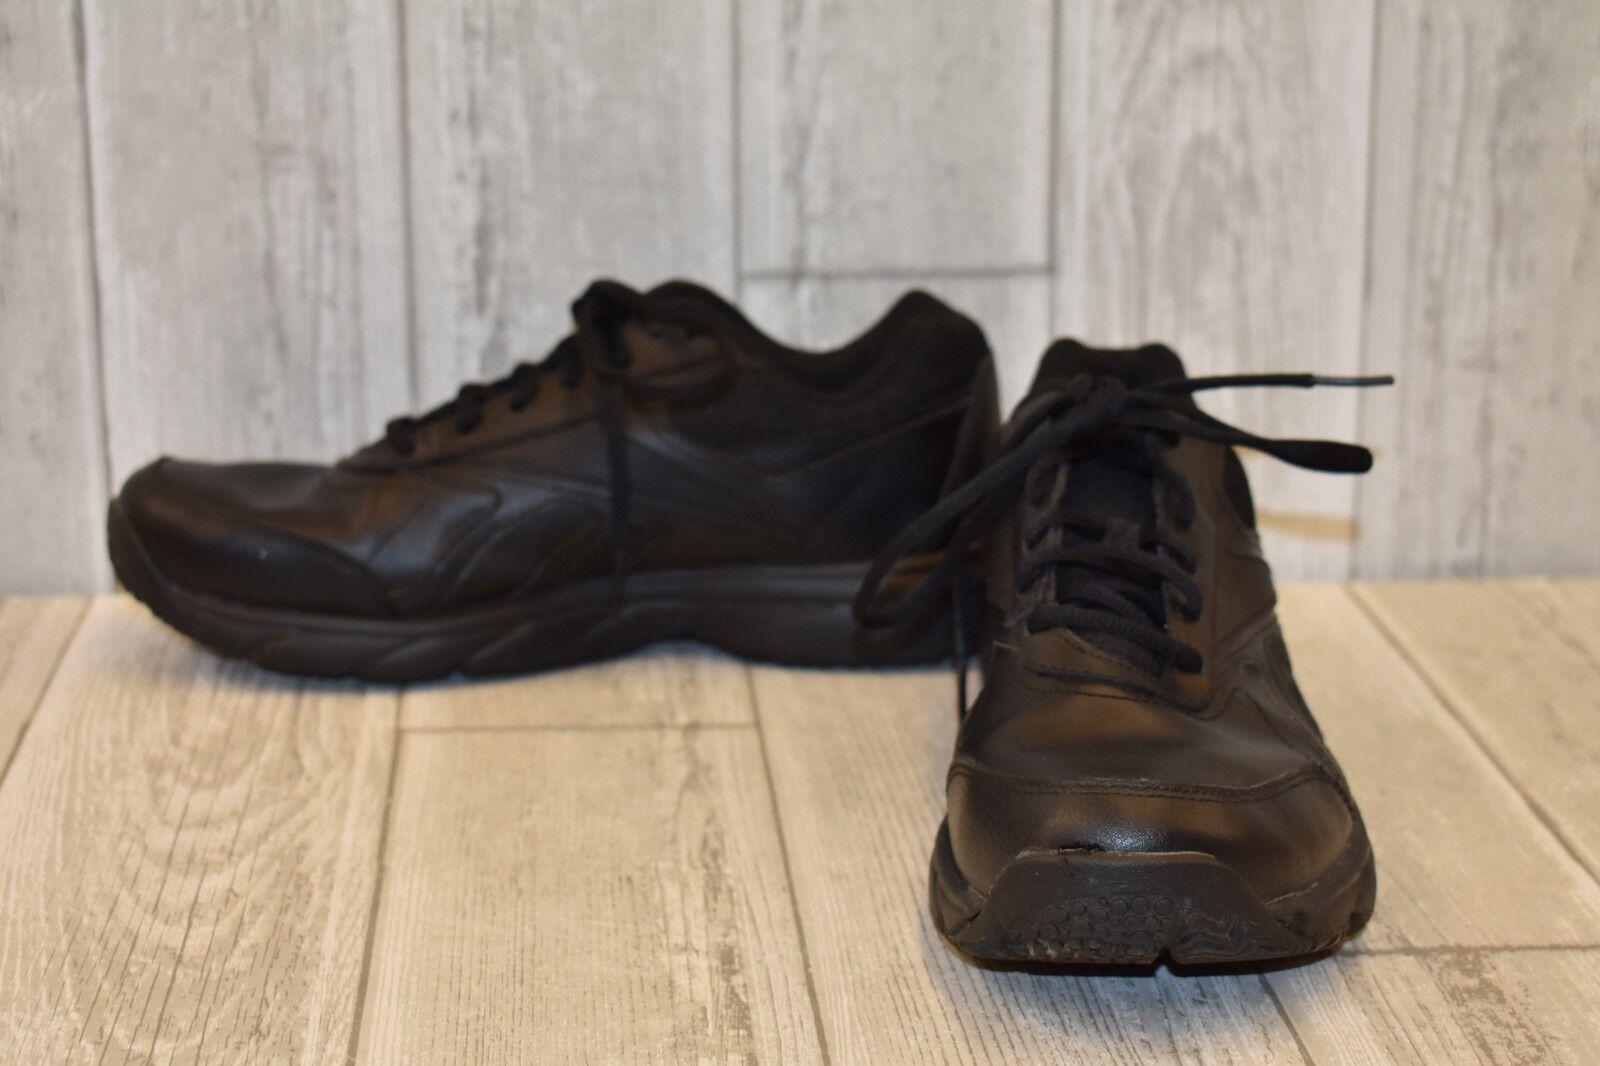 Reebok Work N Cushion Sneaker - Men's Size 8 Black